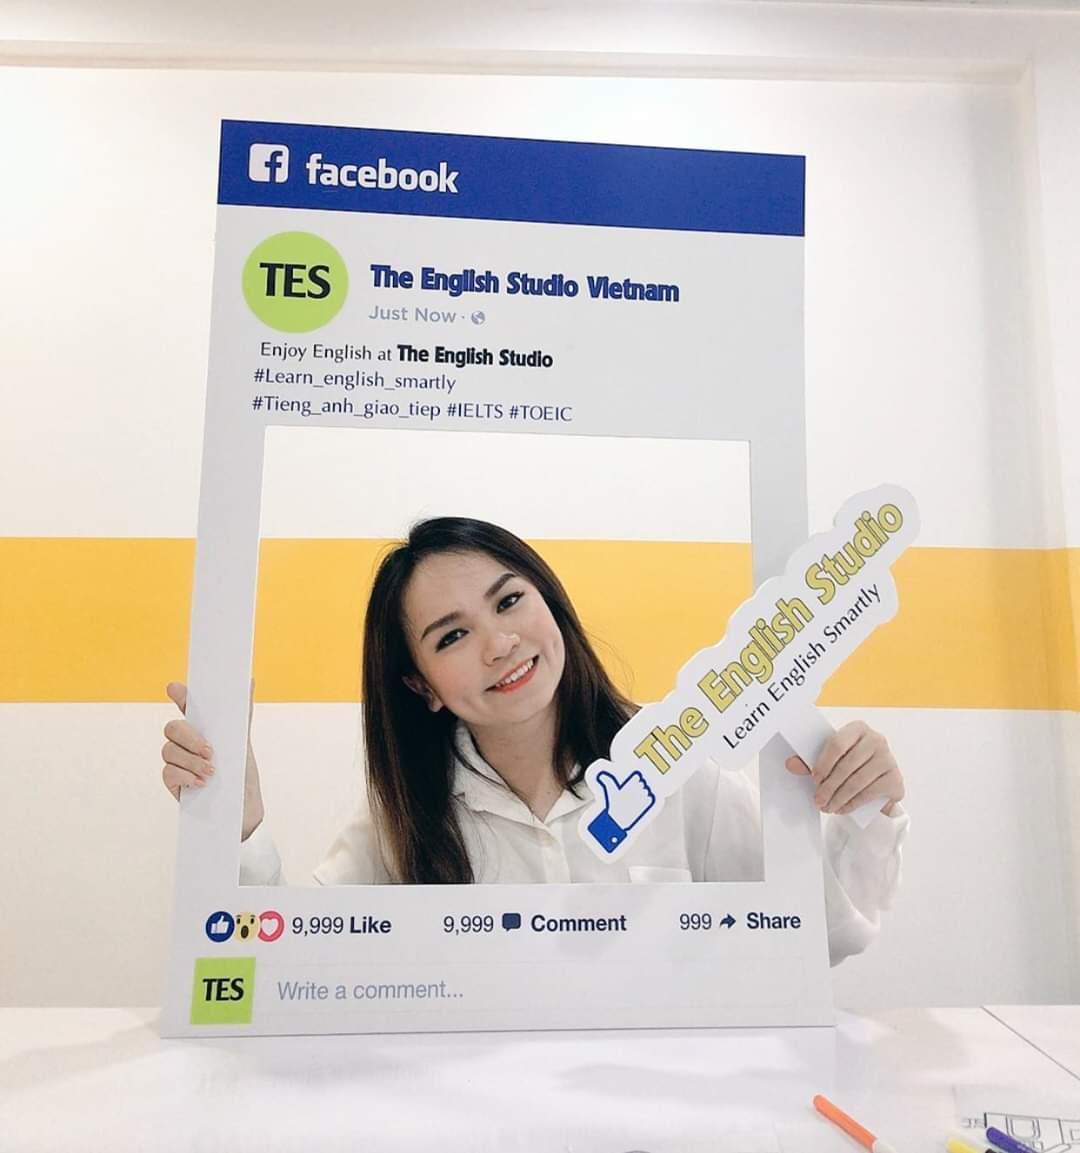 Bảng check in facebook